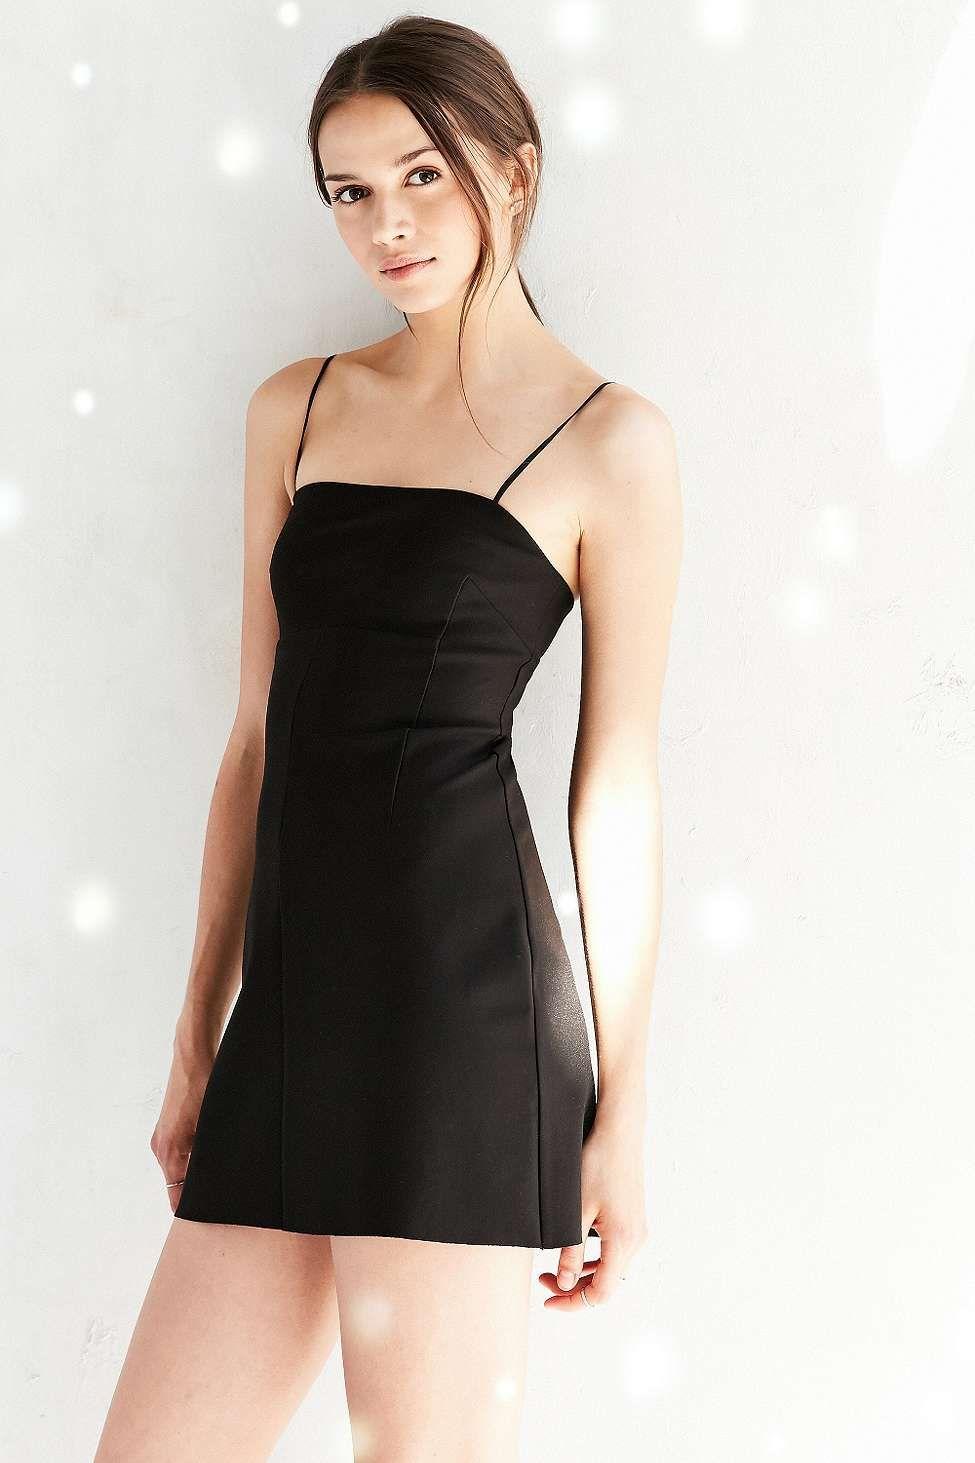 Silence Noise Audrey Black A Line Mini Slip Dress Mini Slip Dress Slip Dress Urban Dresses [ 1463 x 975 Pixel ]